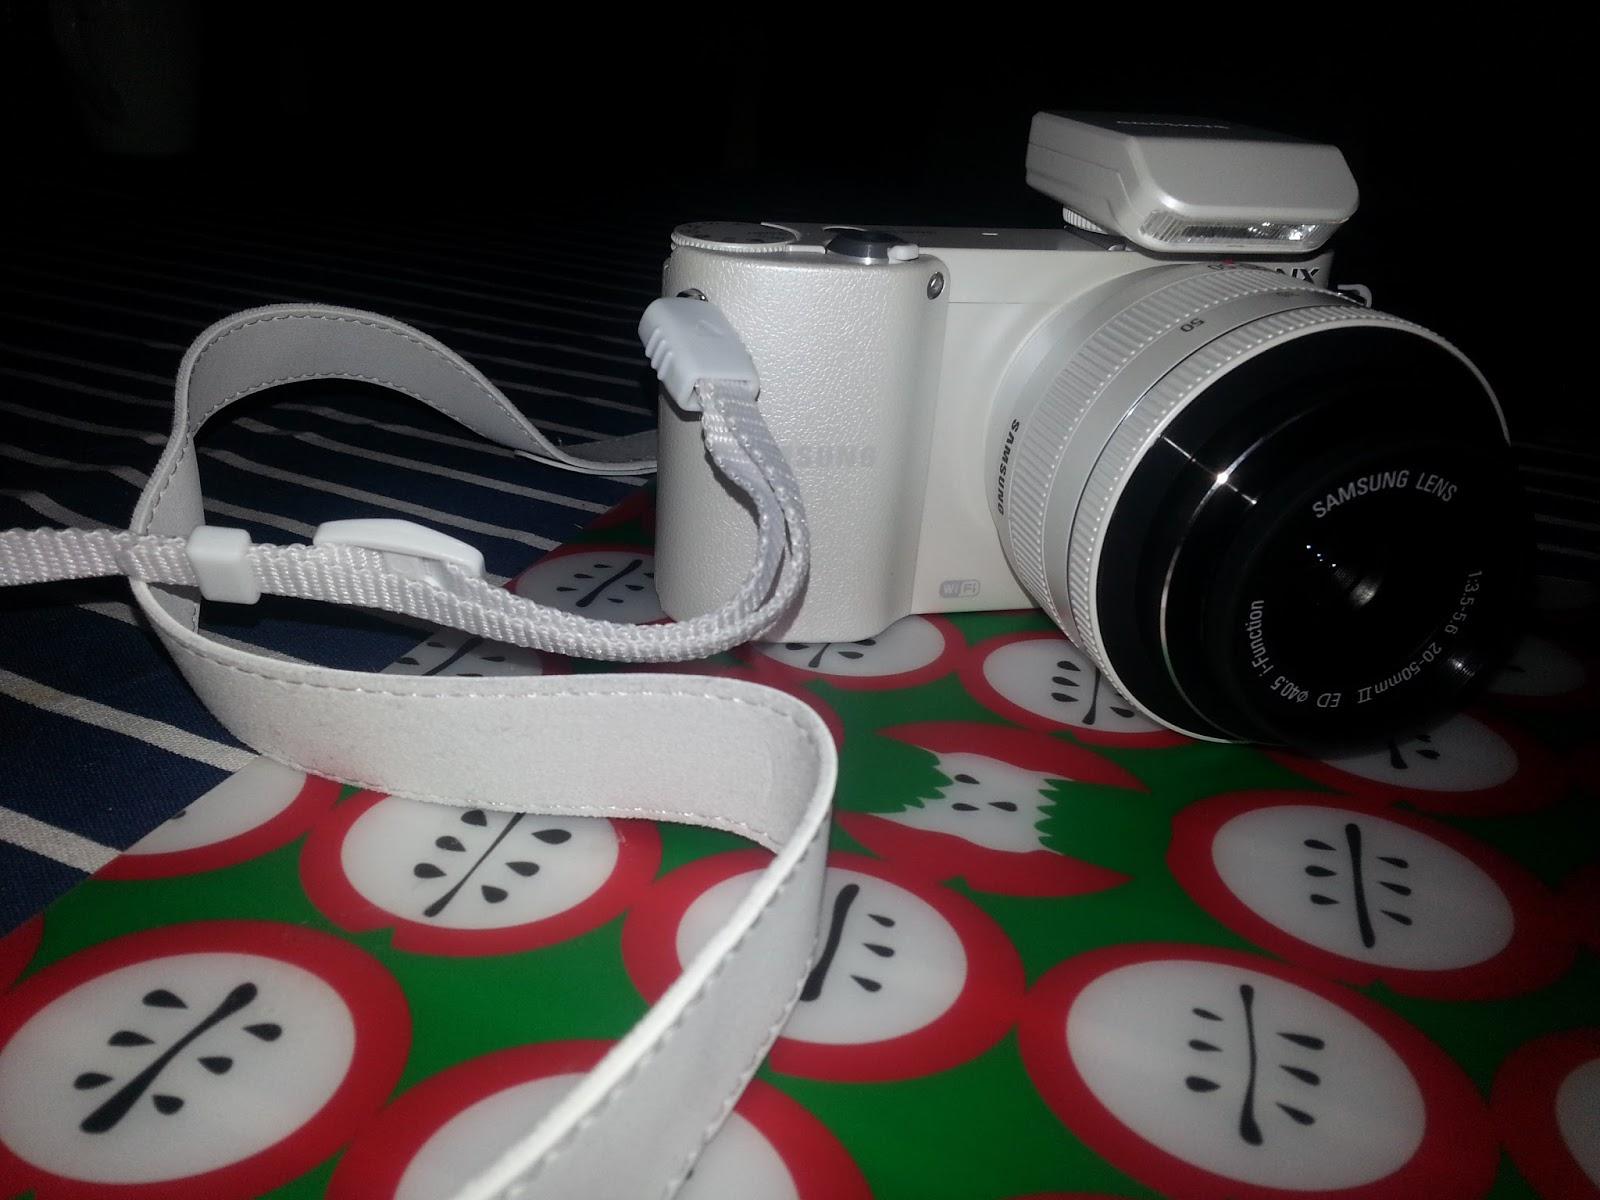 Samsung smart camera nx1100